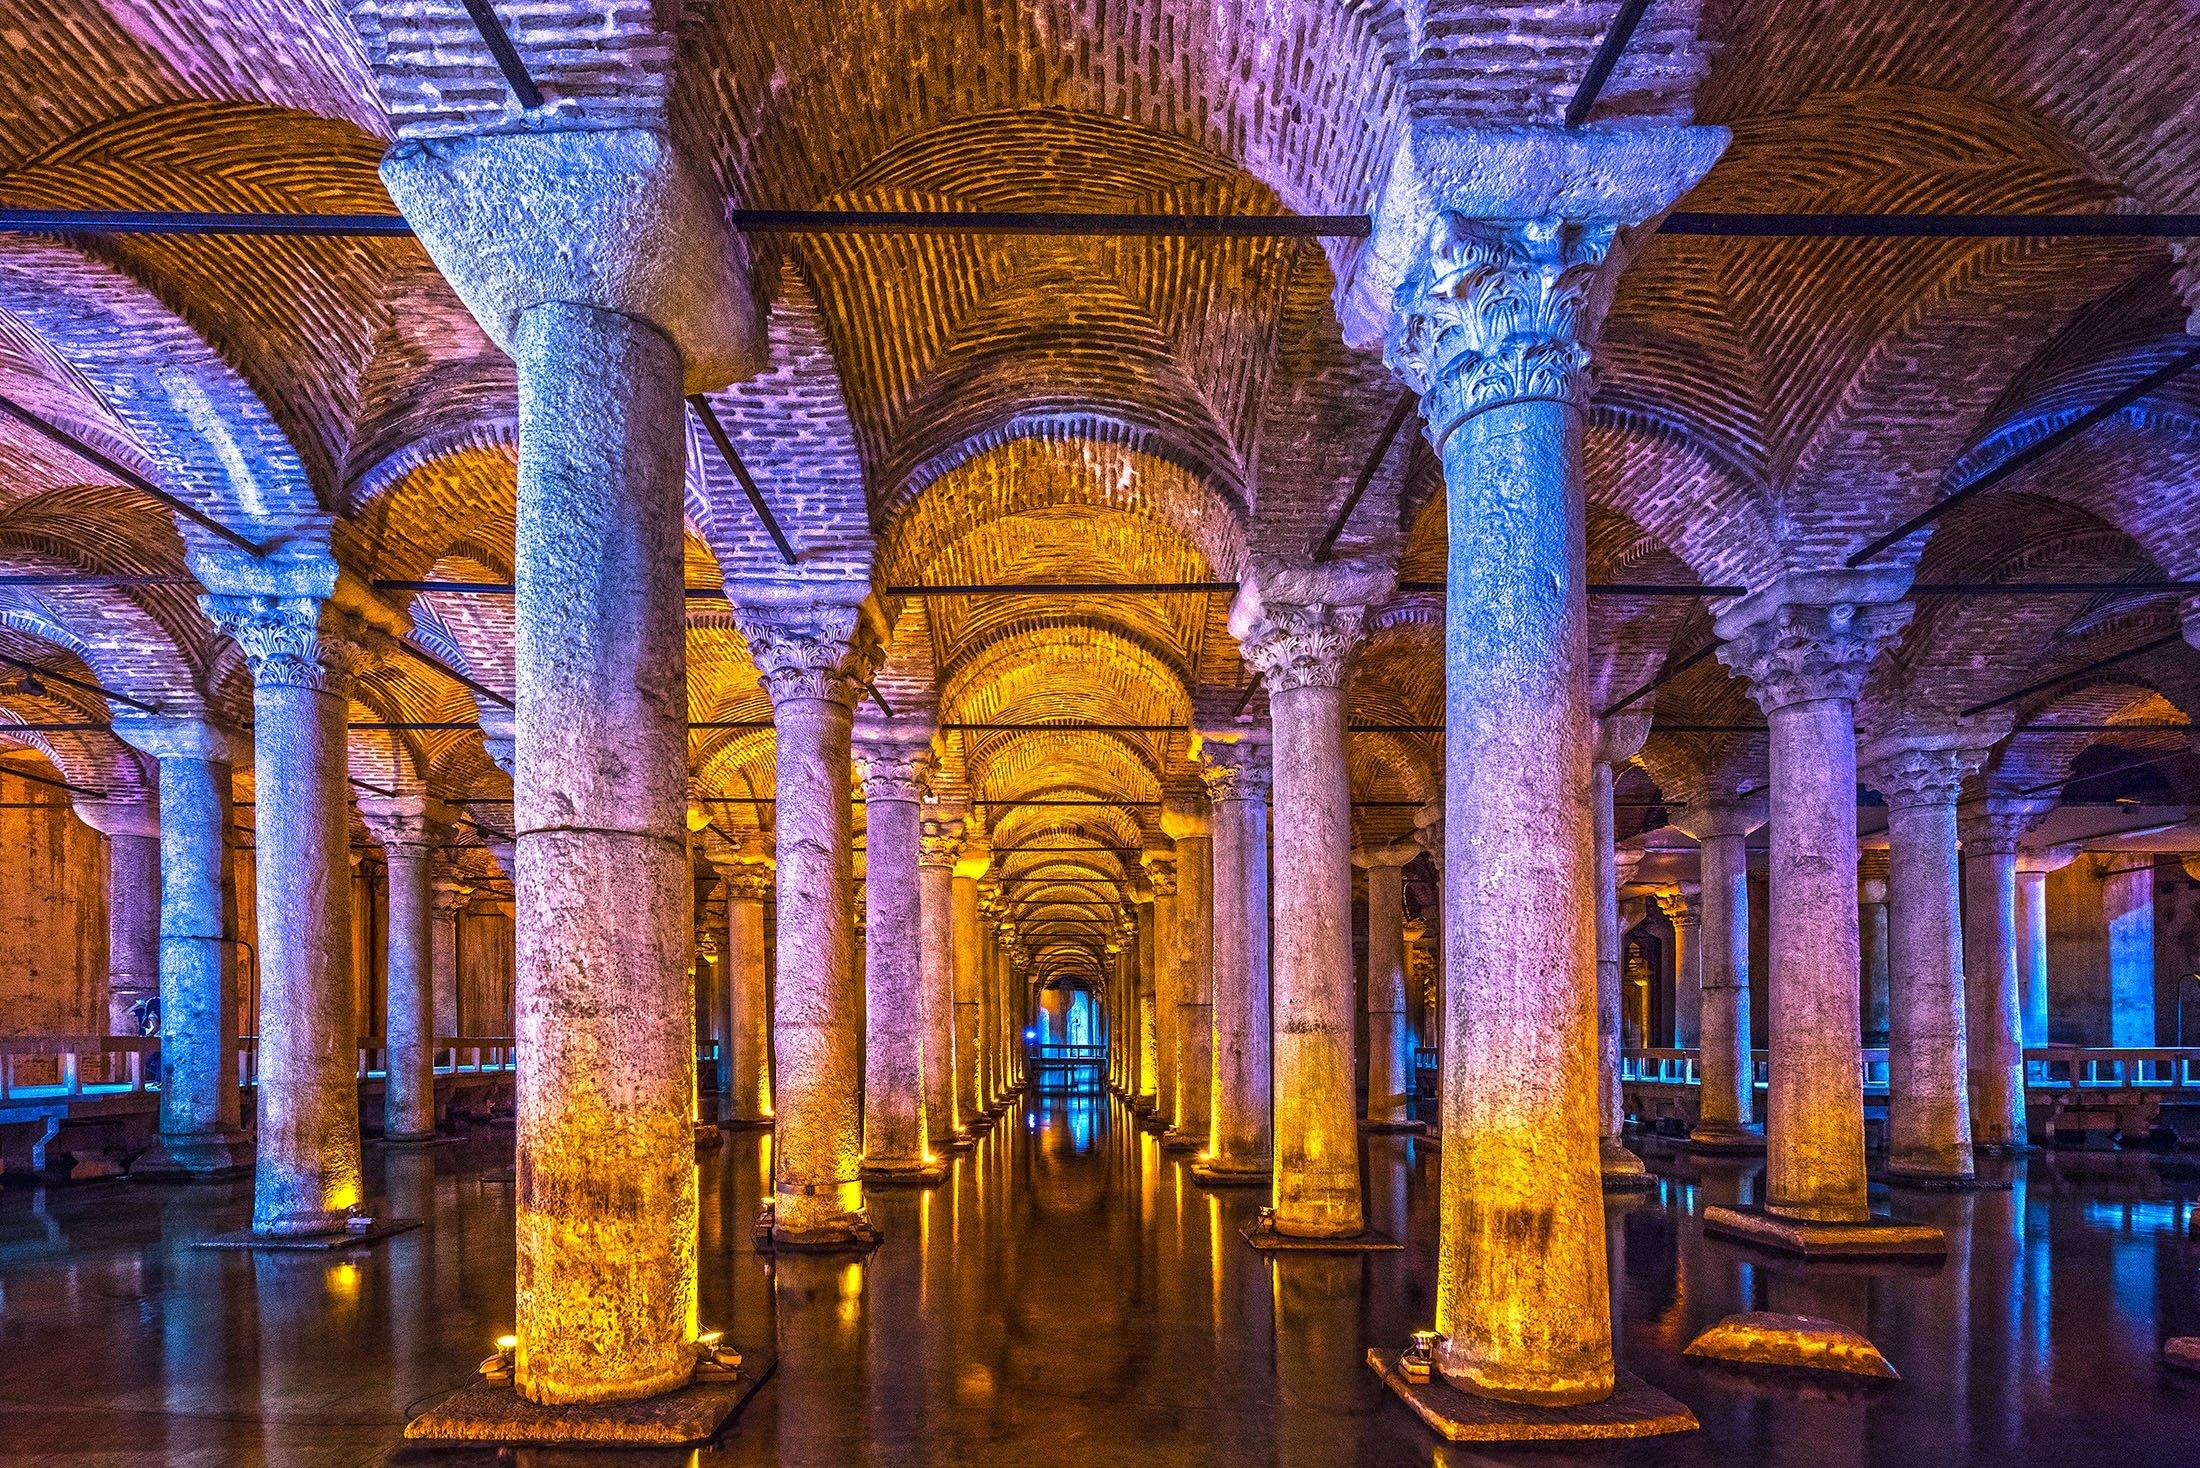 The Basilica Cistern. (Shutterstock Photo)